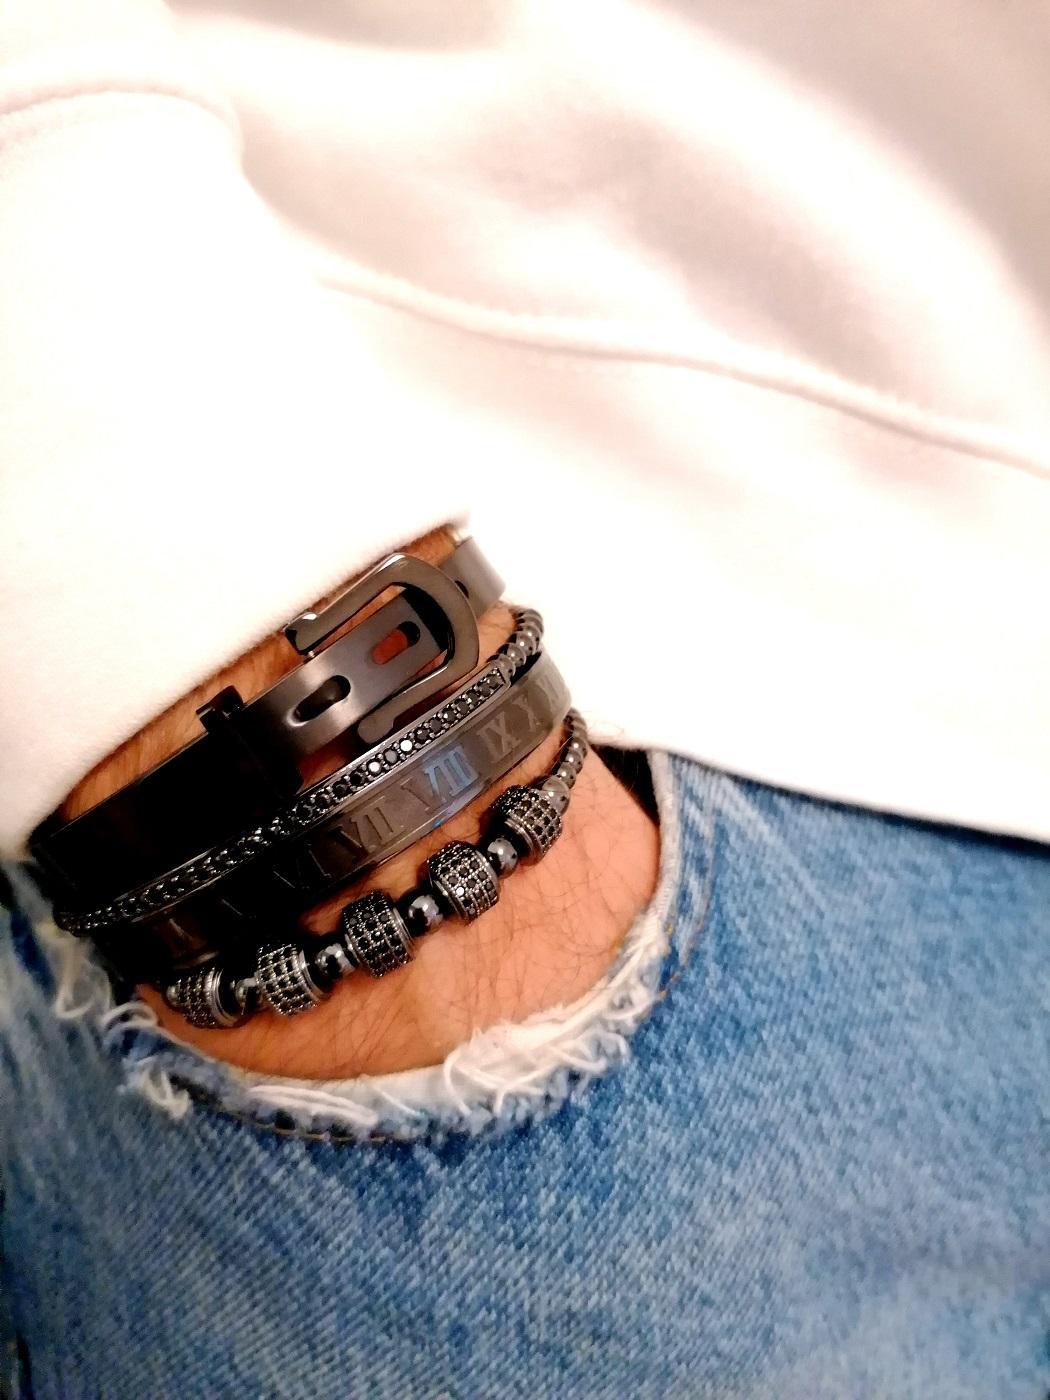 Black And Gold Bracelet Mens, Black Diamond Bracelet Womens, Mens Black Metal Bracelet, Mens Black Stainless Steel Bracelet, Mens Bracelets Silver And Black, Metal Charm Bracelets New York